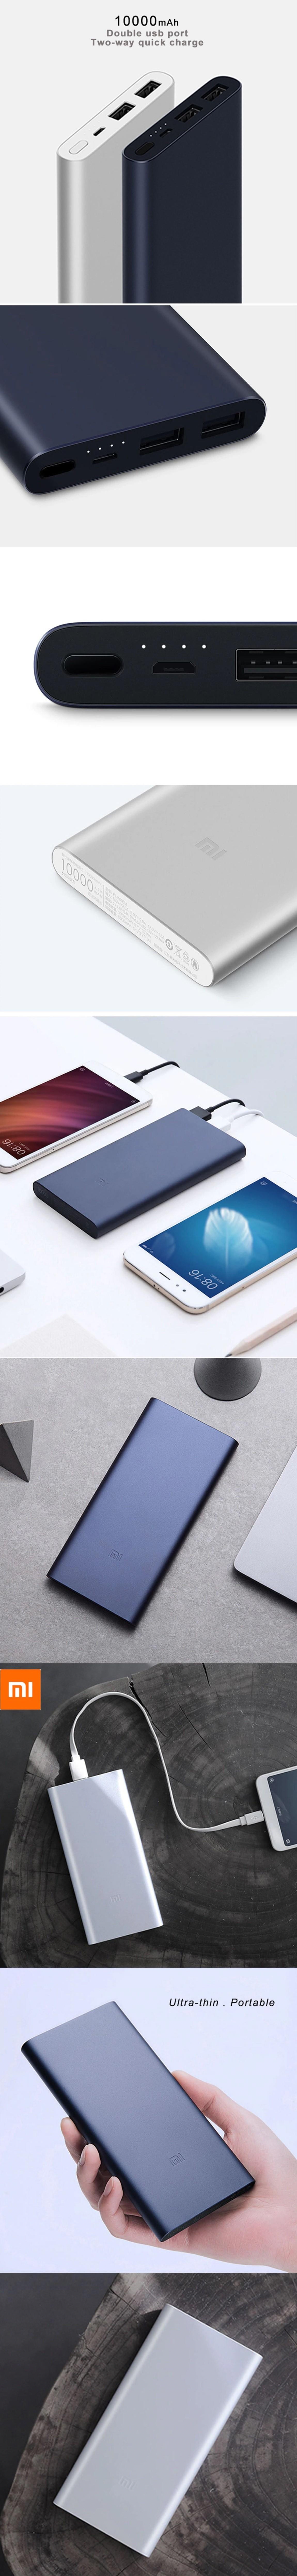 Prezentare-Xiaomi-Mi-Power-Bank-2S9678d059338b6a0a.jpg